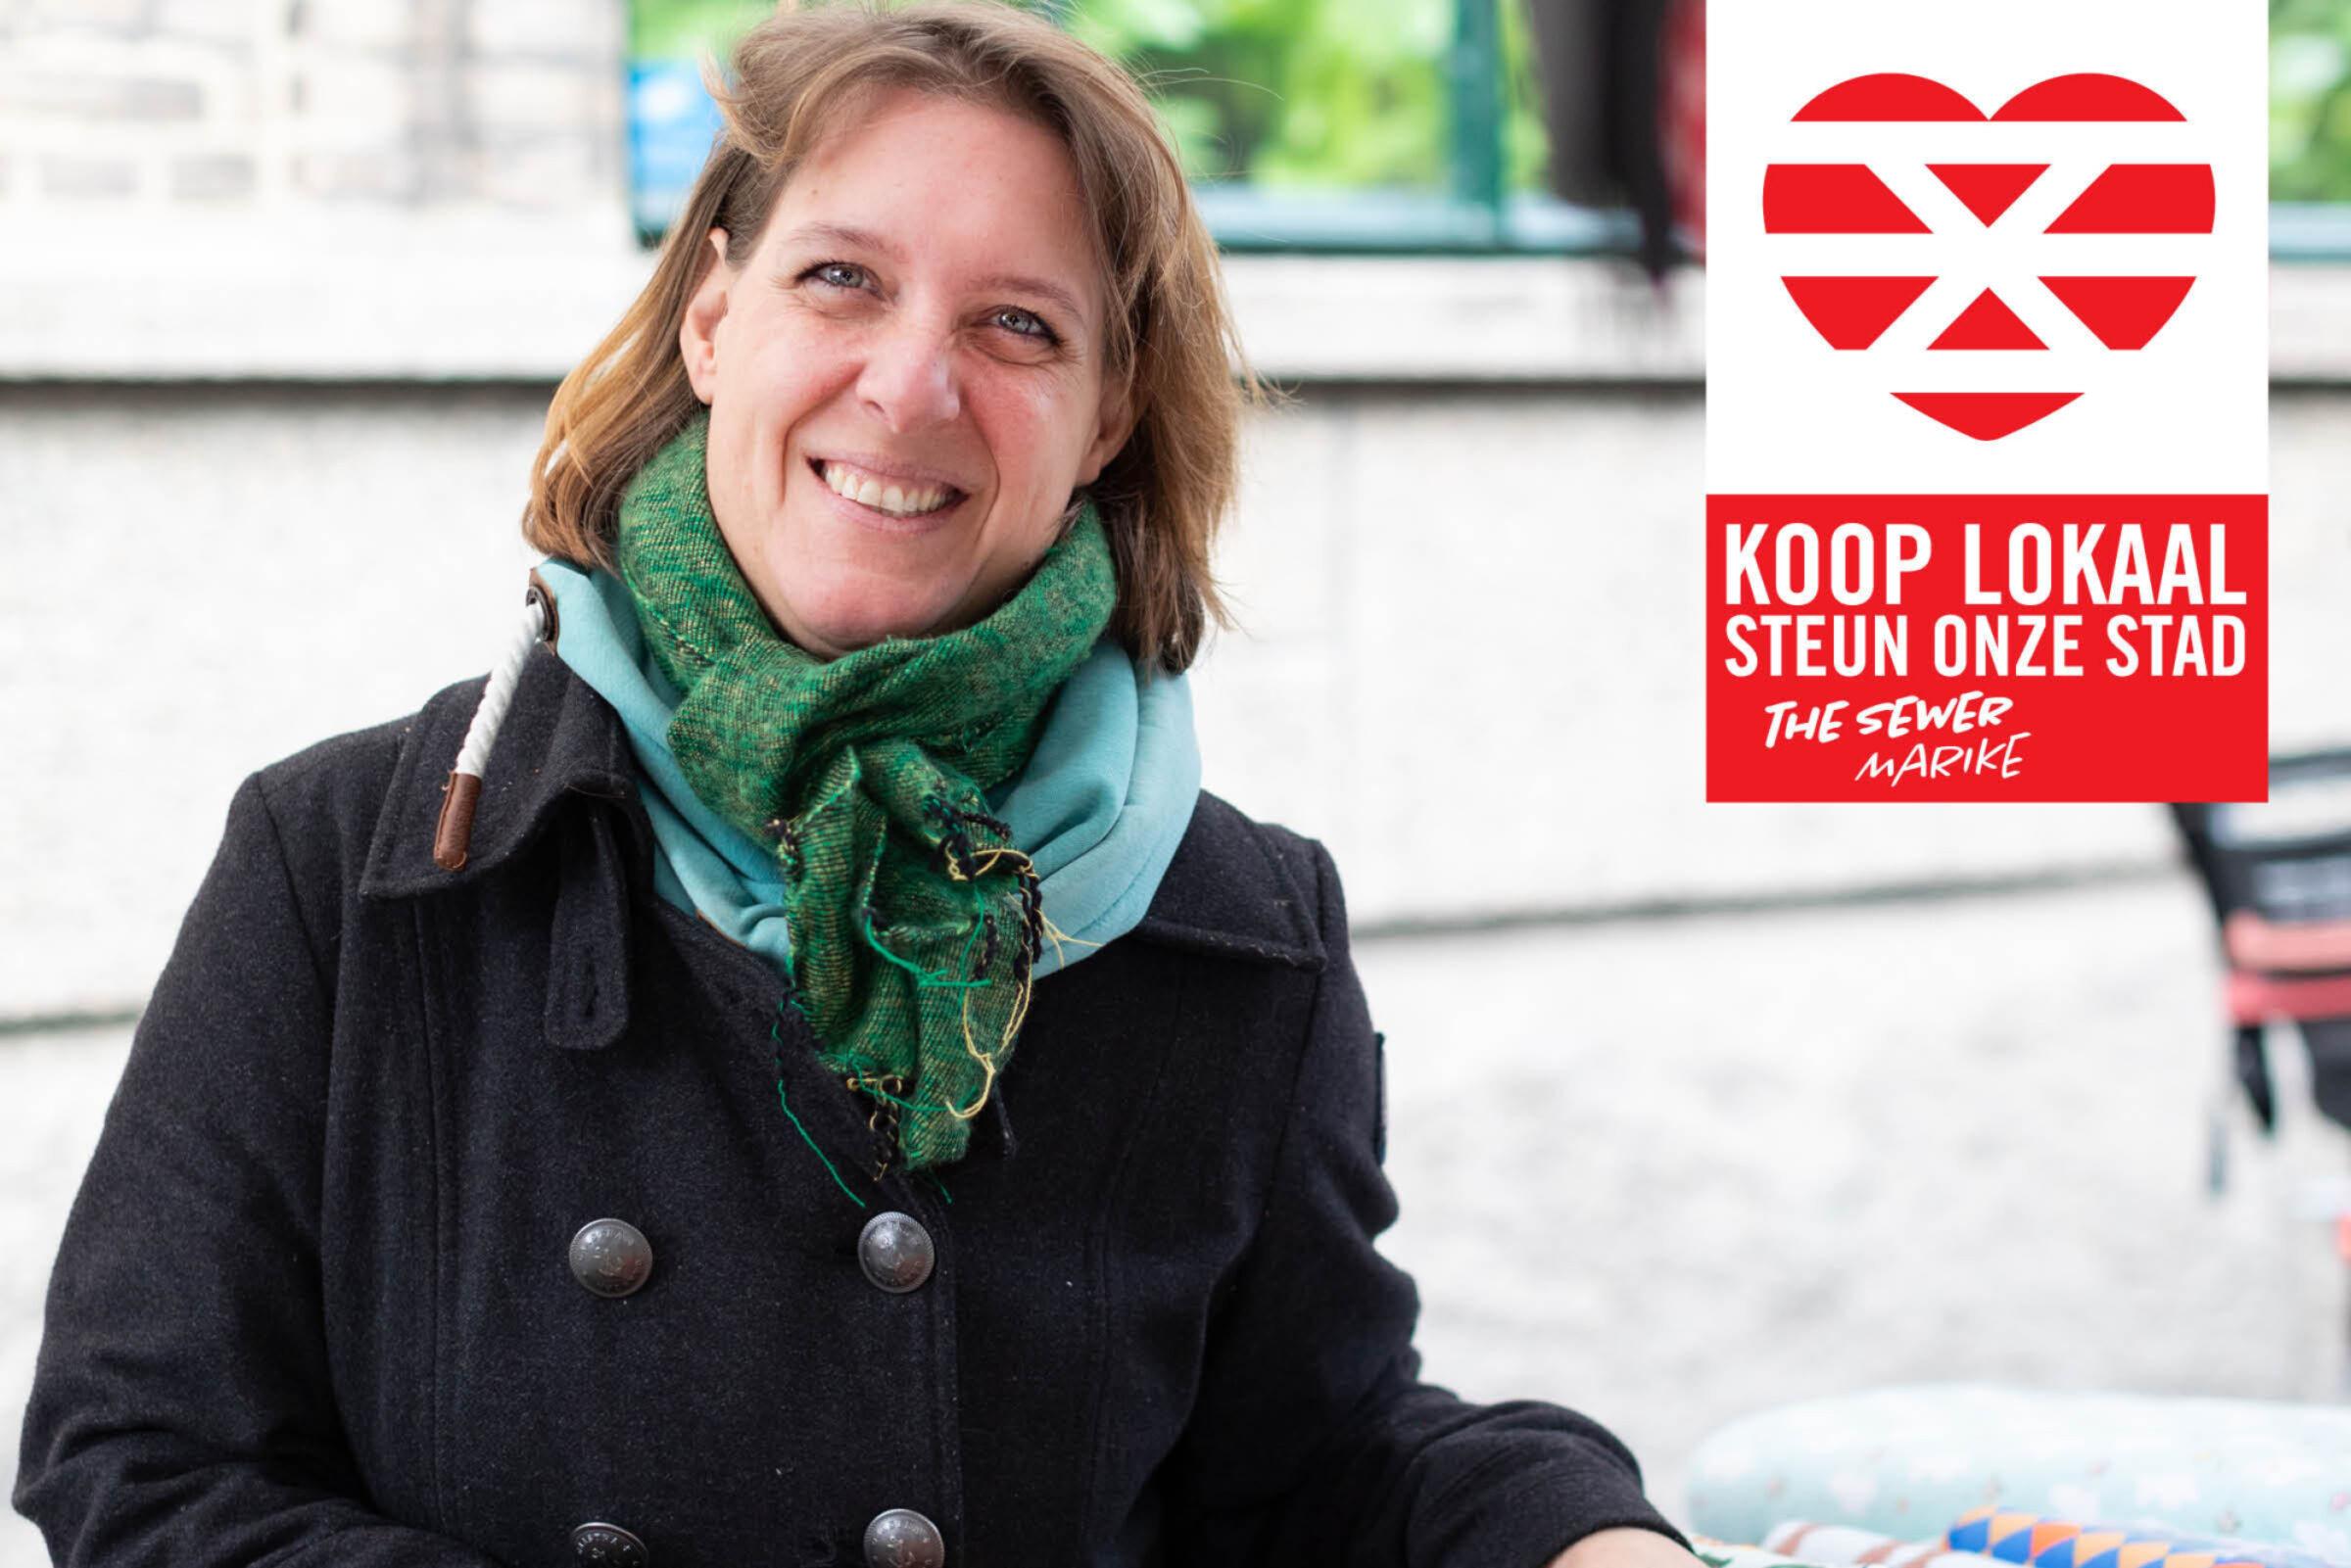 Steun onze stad Koop lokaal Enschede The Sewer Marike